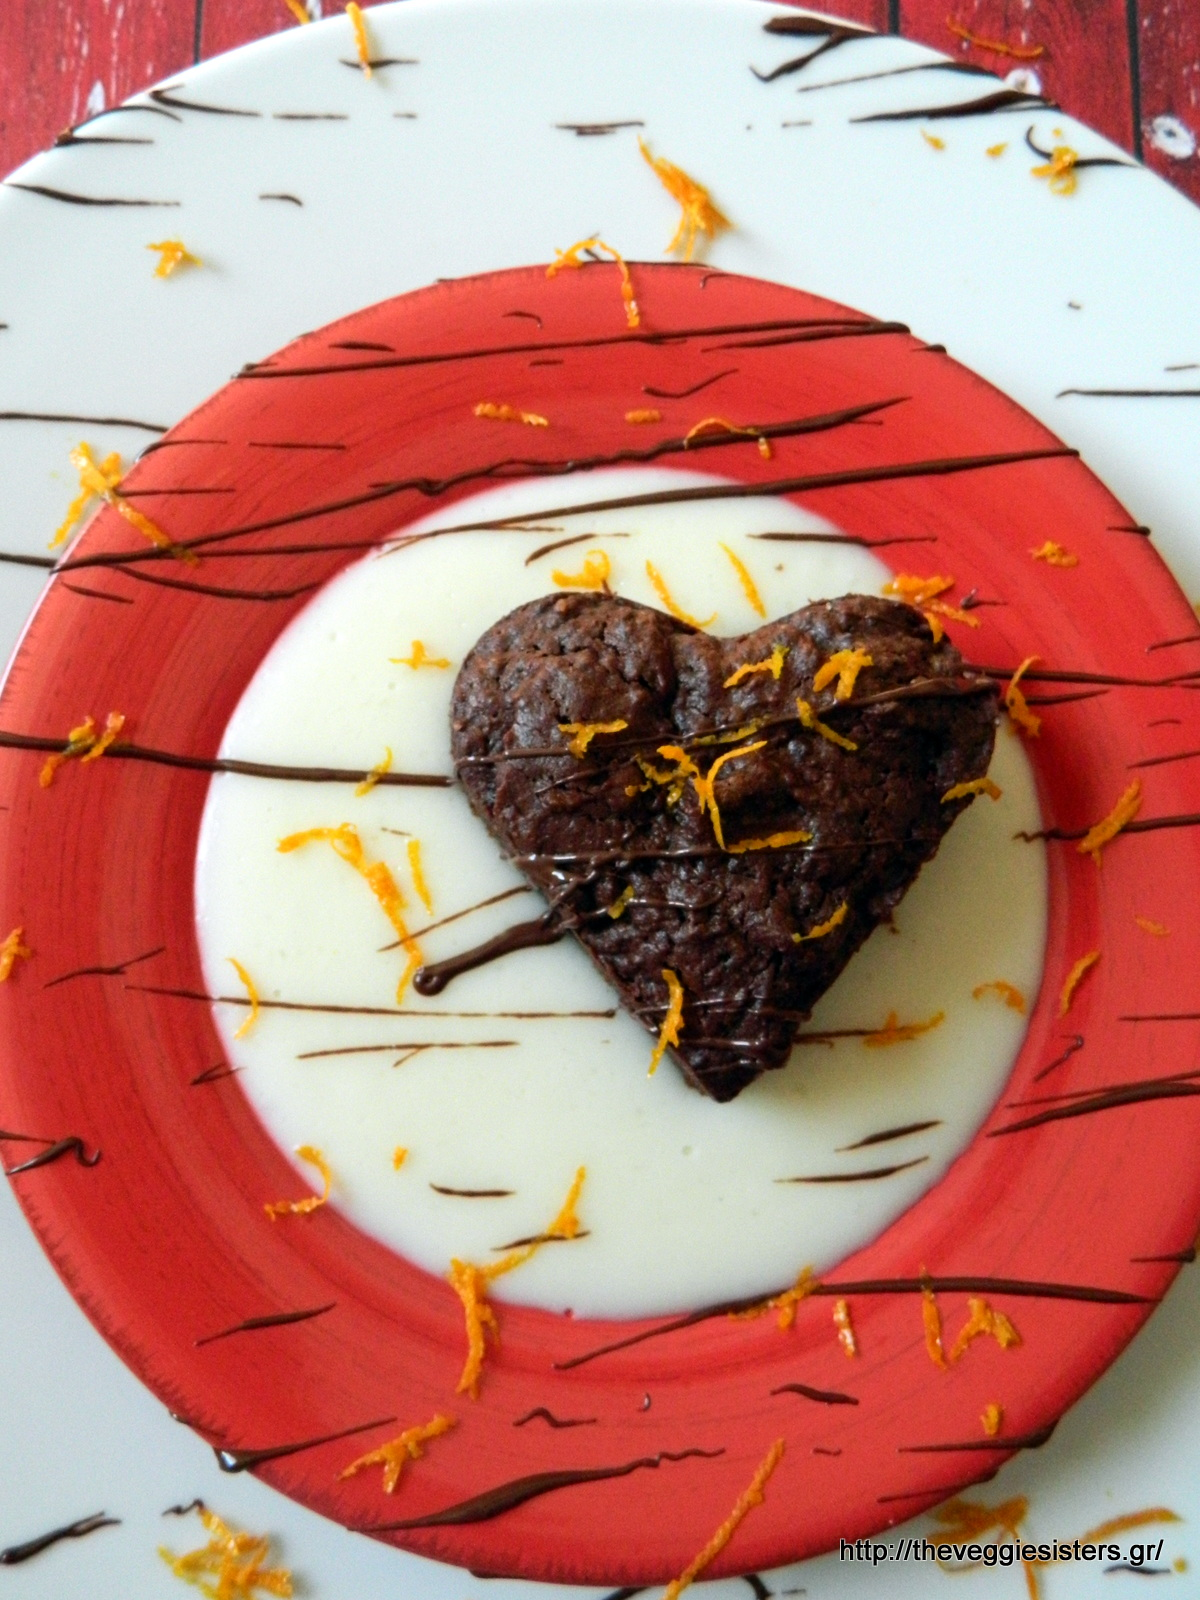 Vegan σοκολατένια καρδιά μπράουνις με πορτοκαλένια κρέμα - Vegan chocolate brownies heart with orange cream